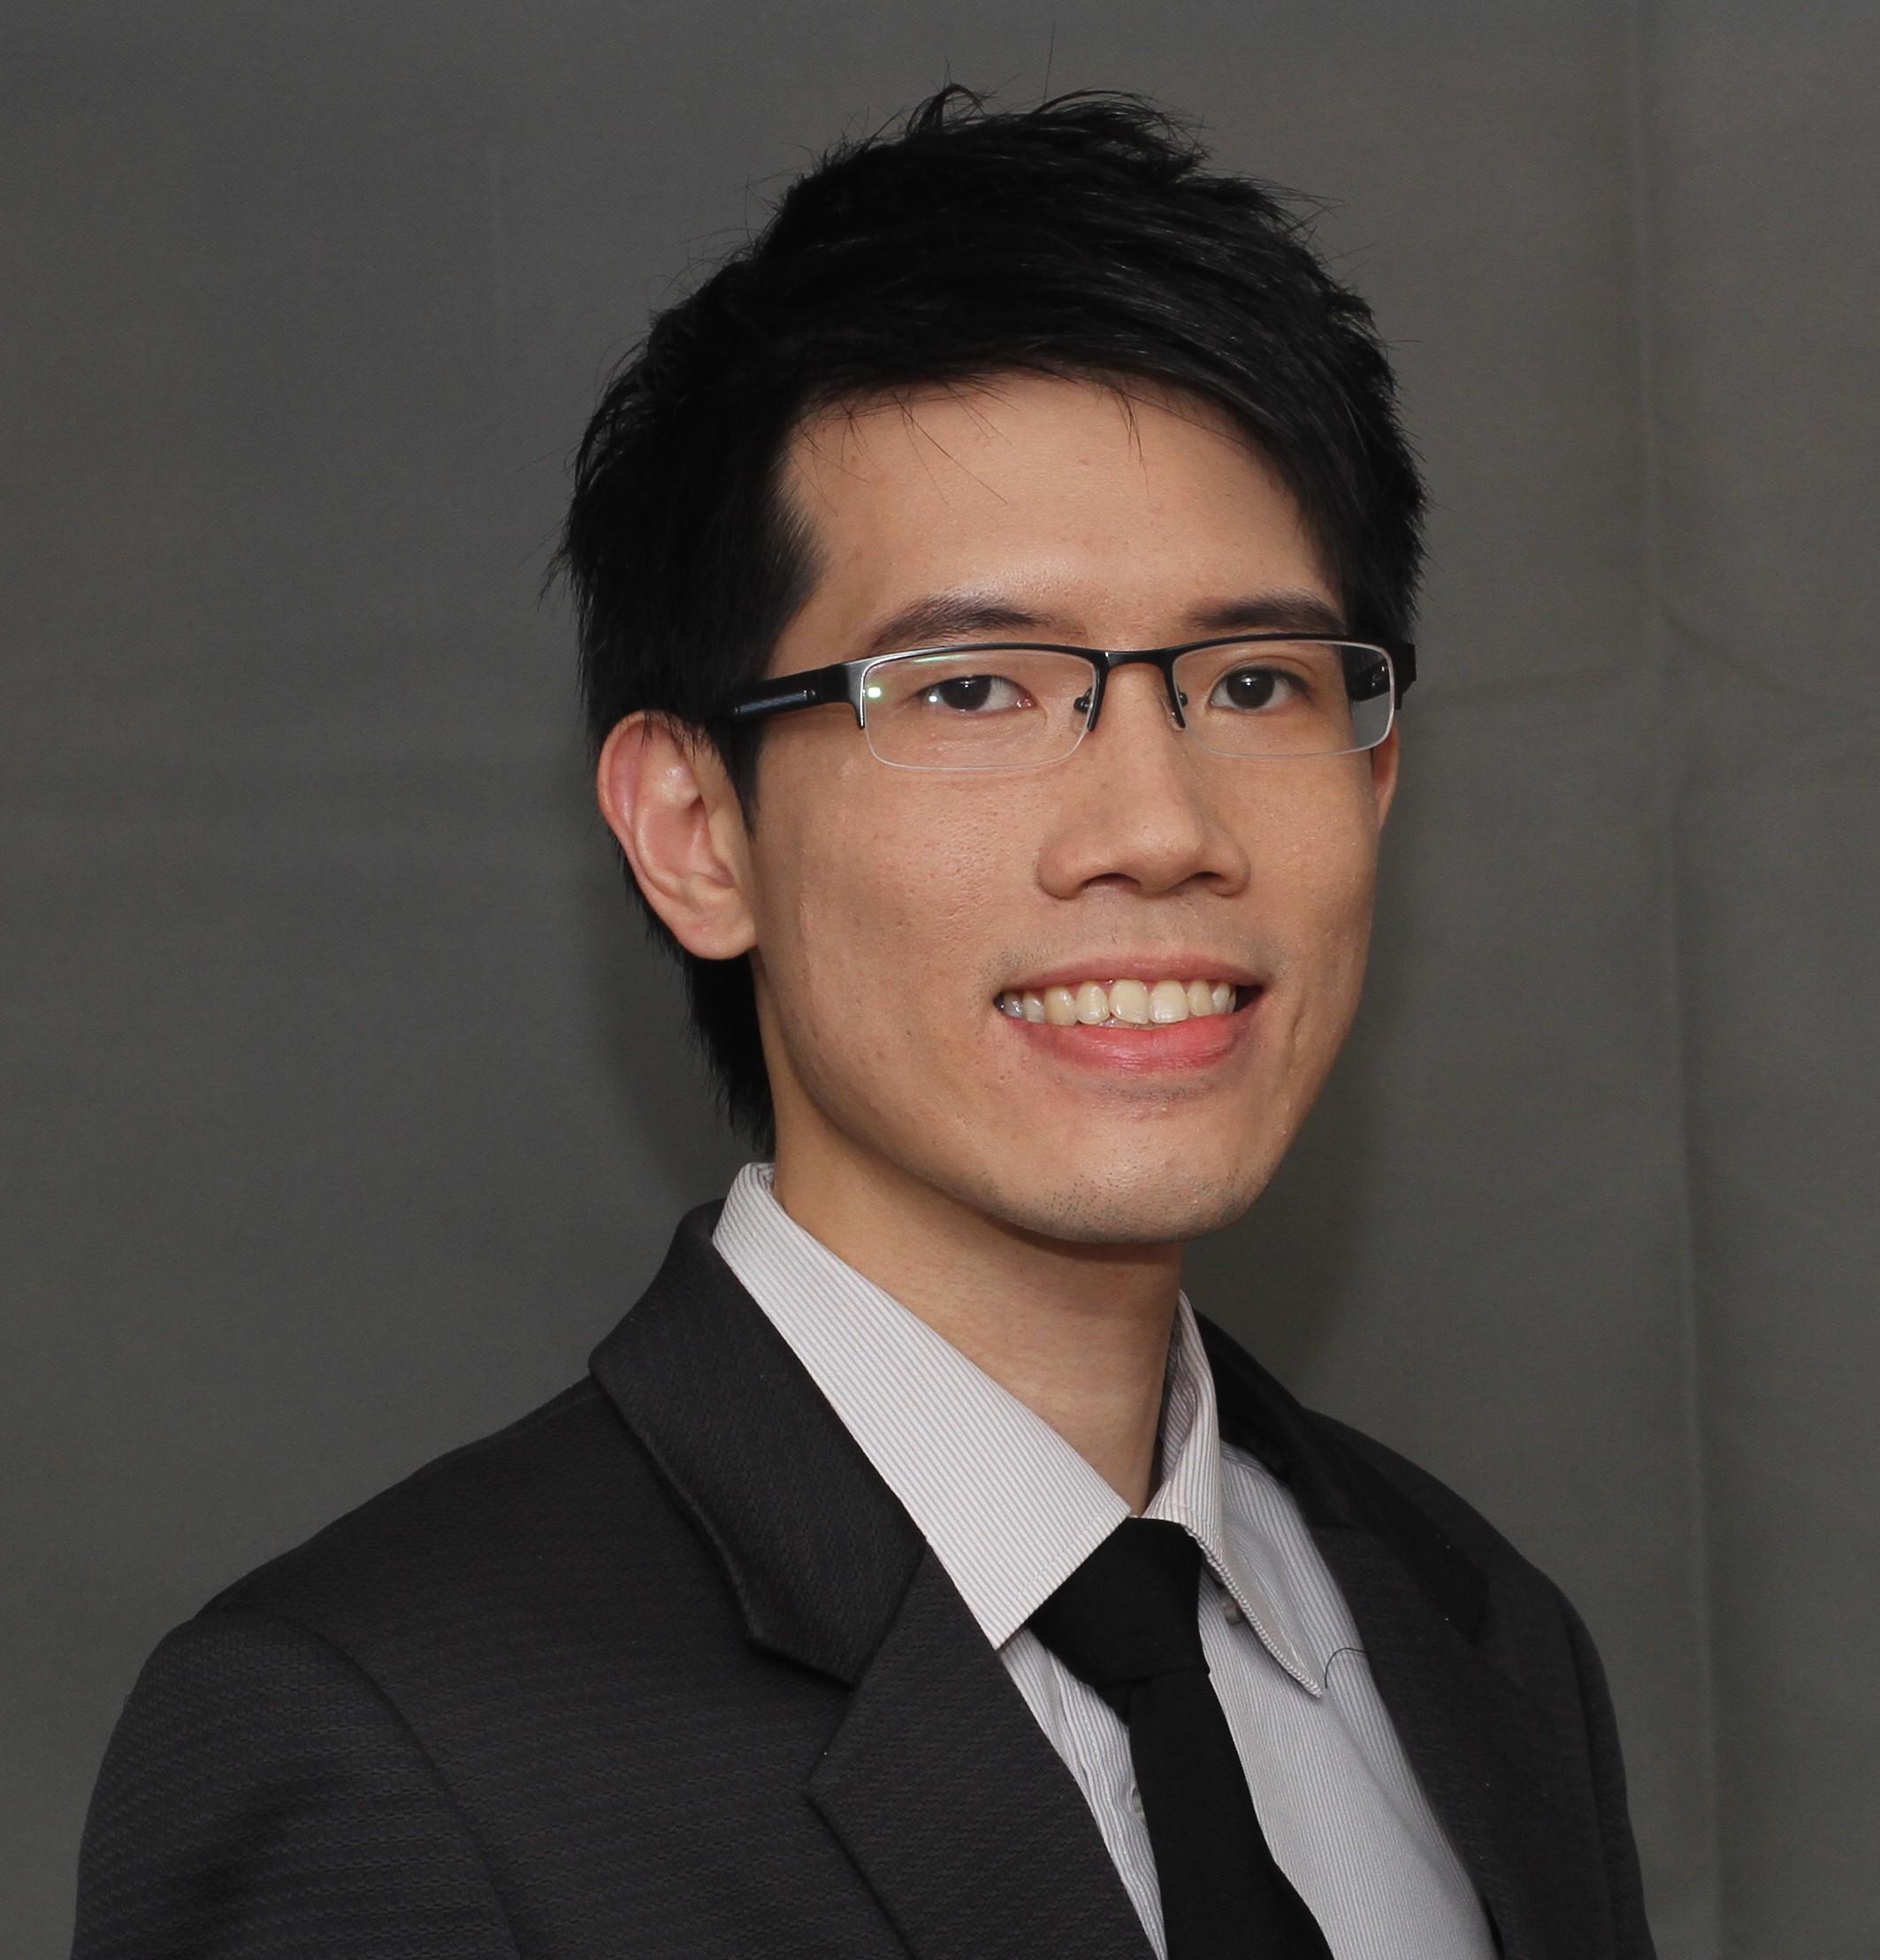 Perrin Chan